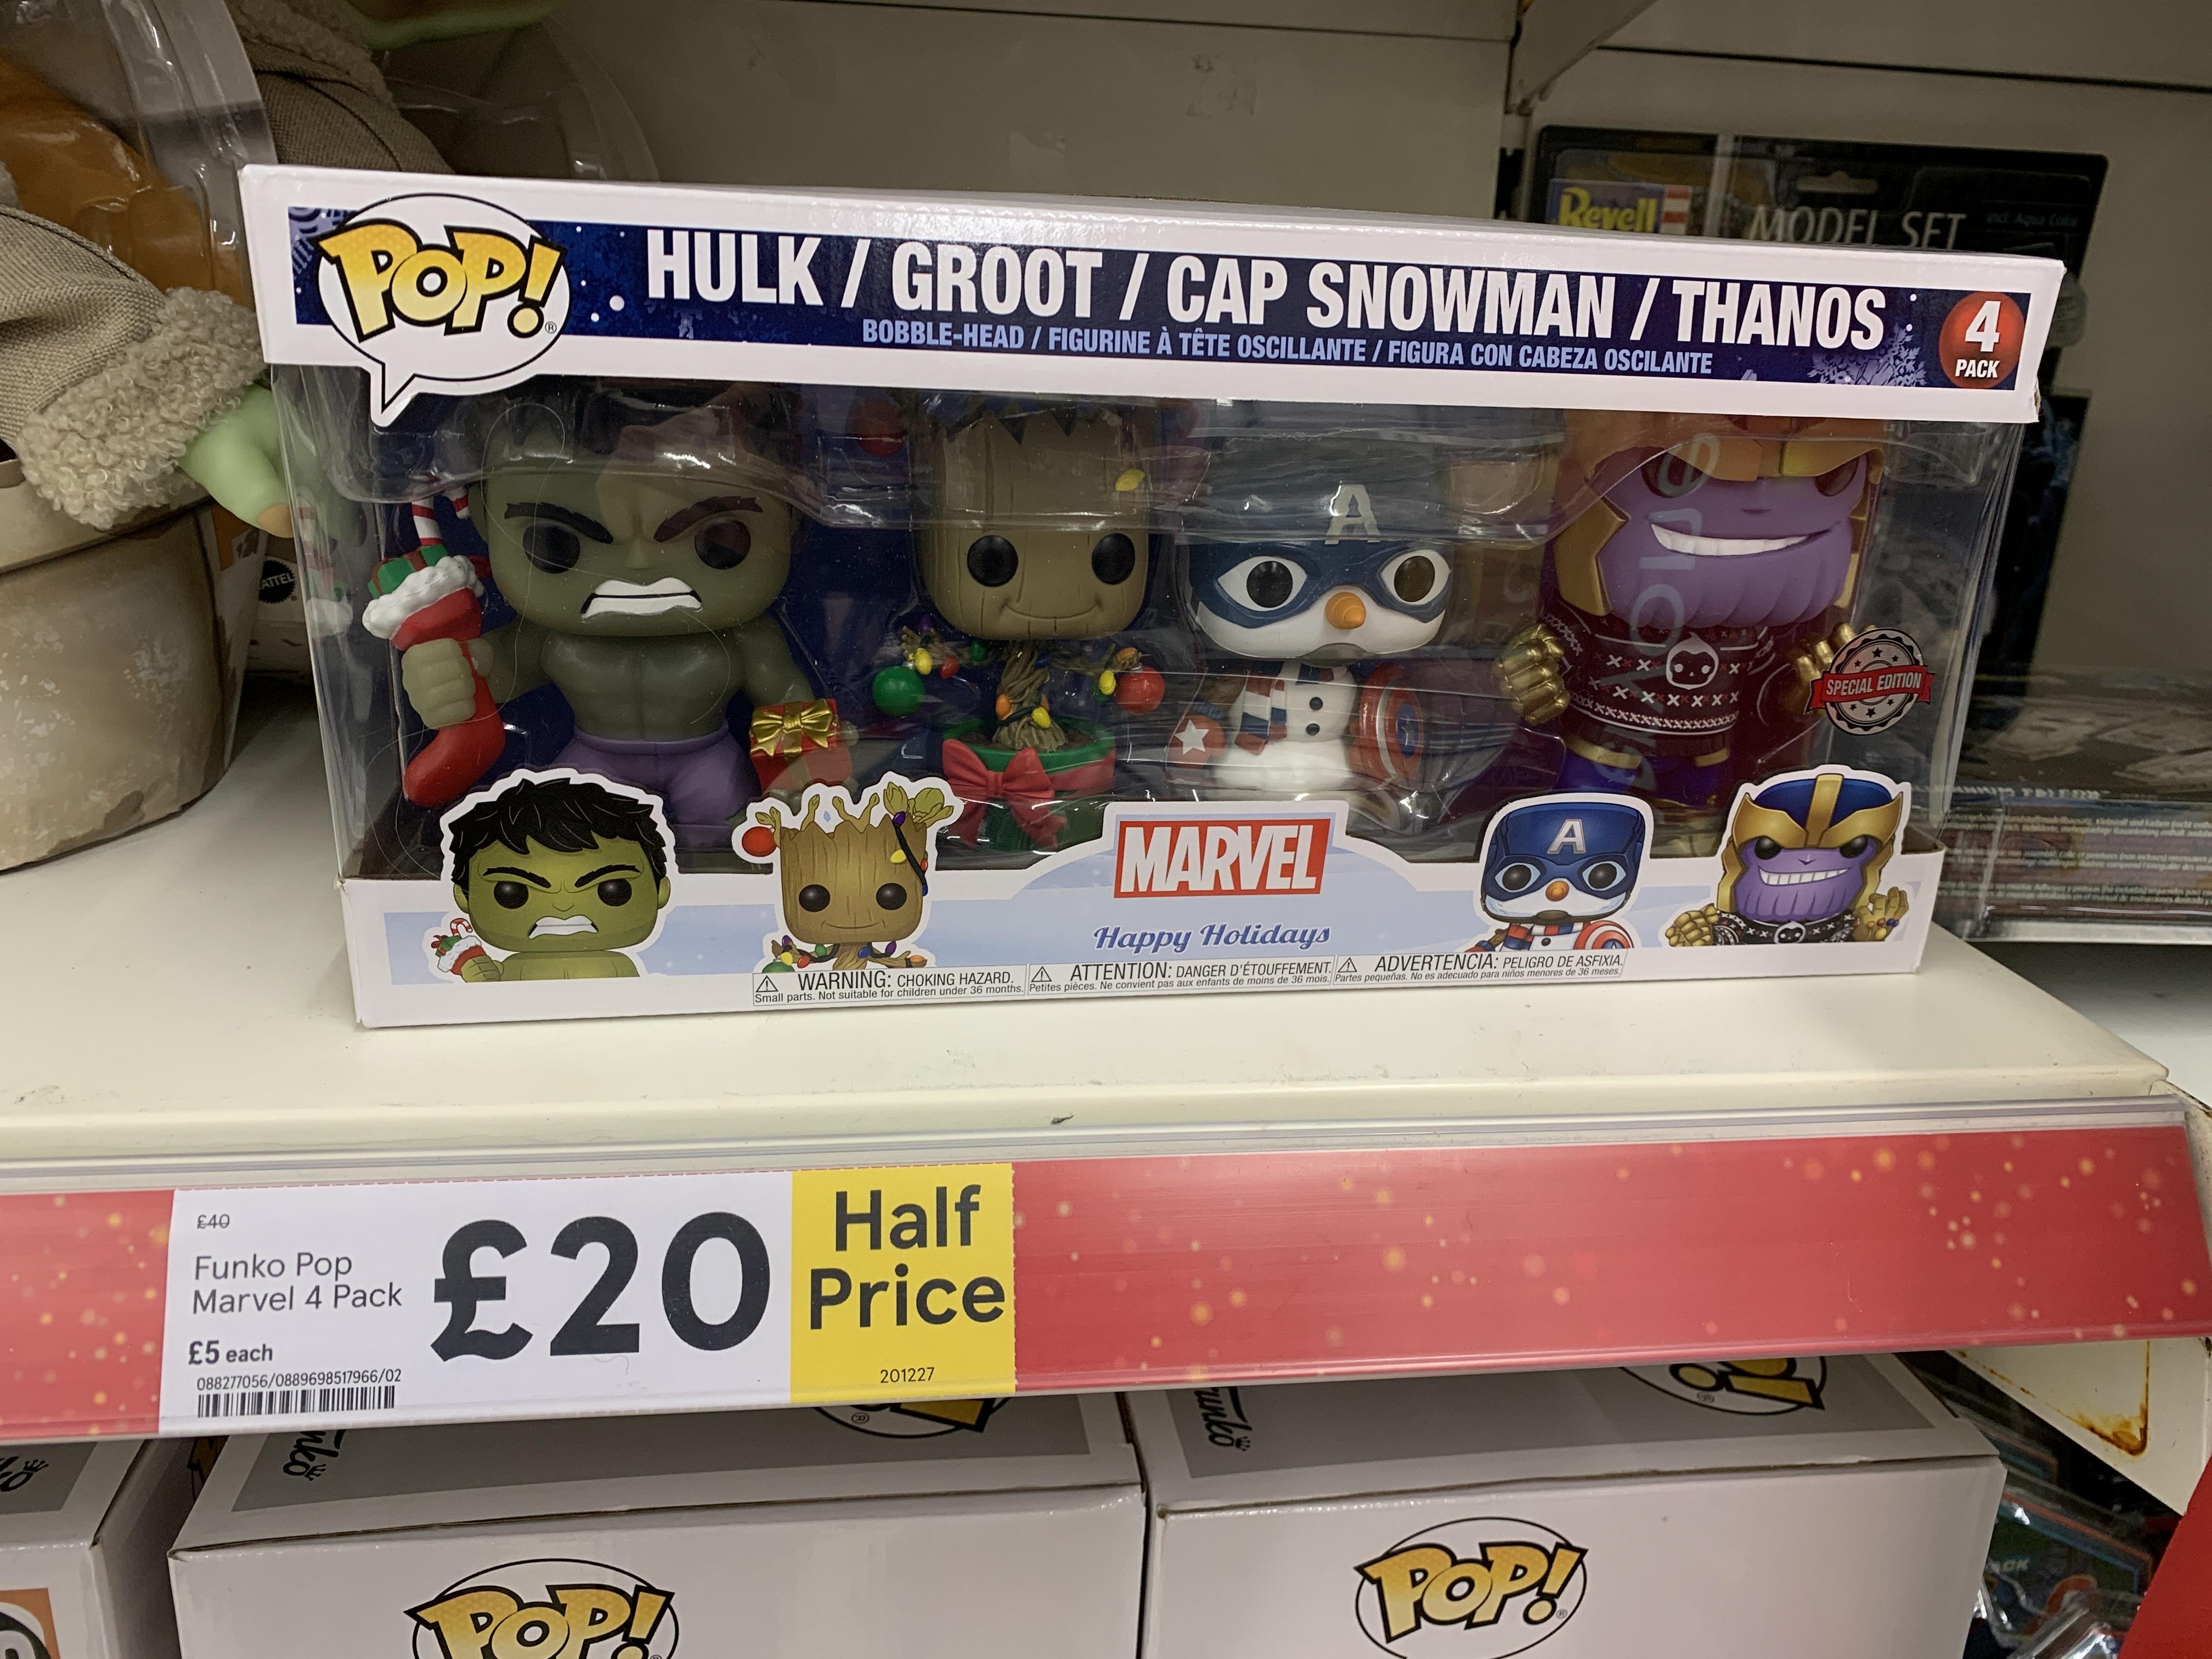 Funko Pop Marvel 4 Pack Christmas Edition Hulk Groot Captain America Thanos @ Tesco Scunthorpe